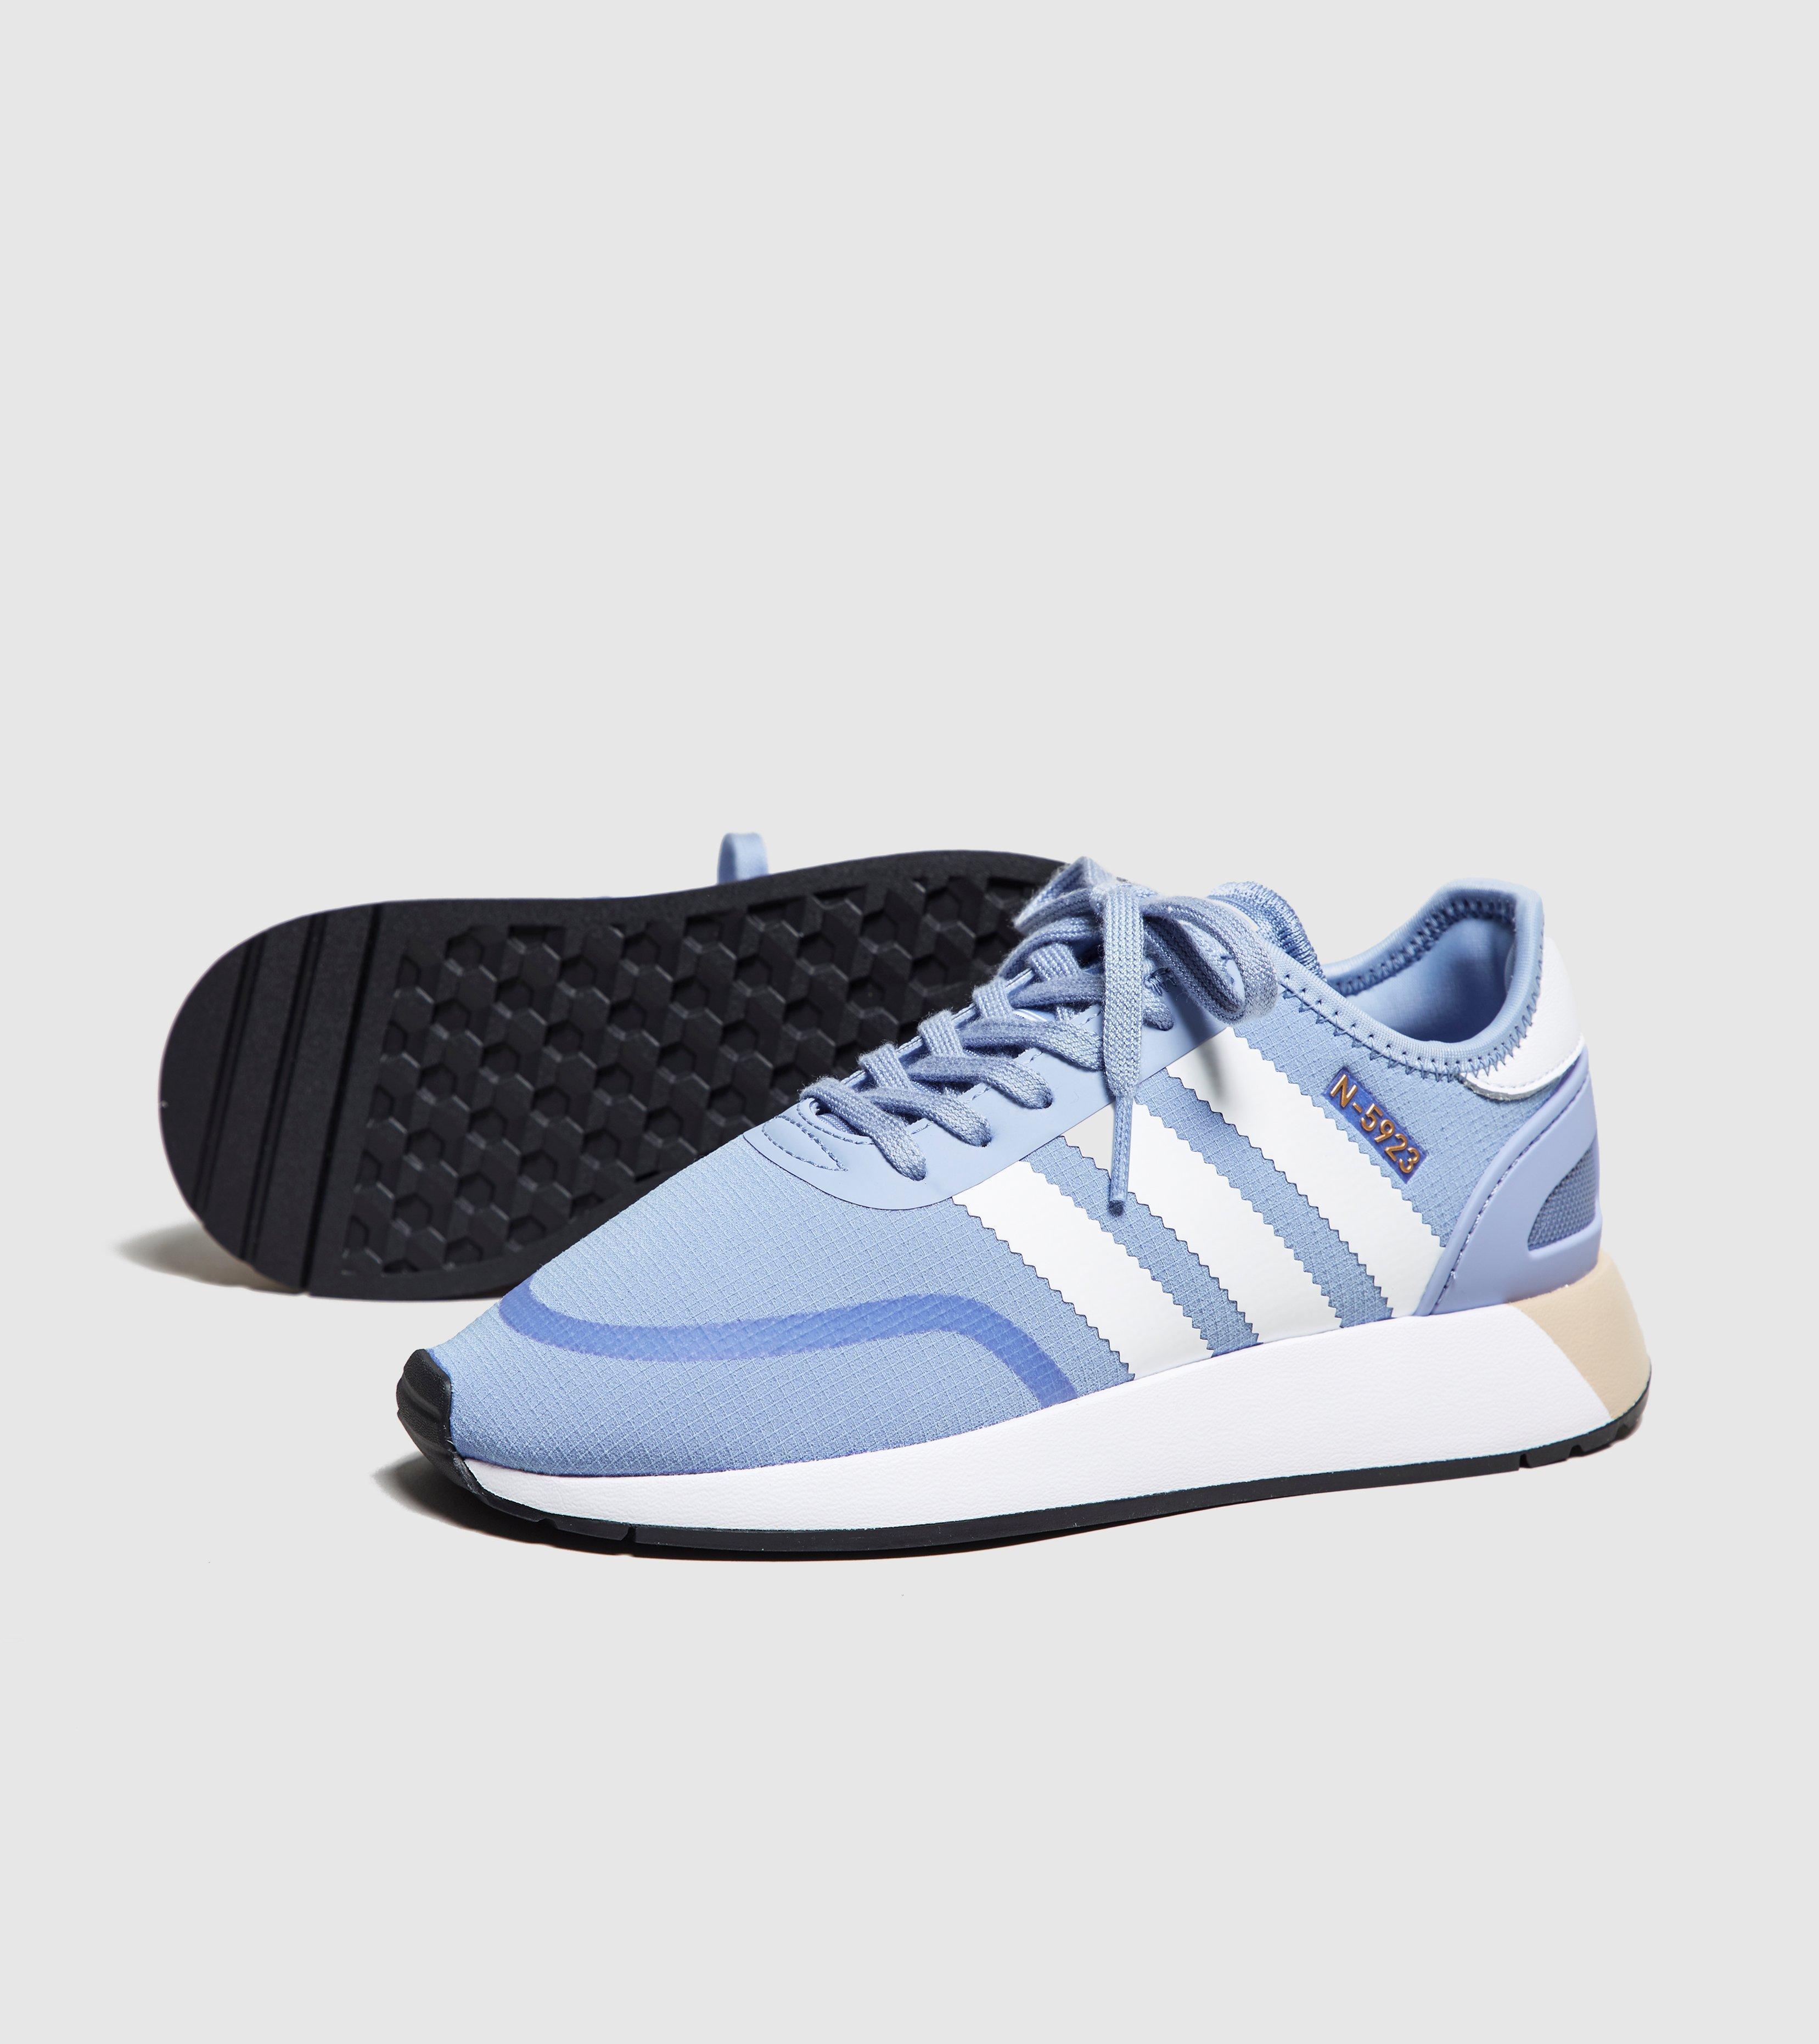 Adidas Originals Blue N-5923 Women's